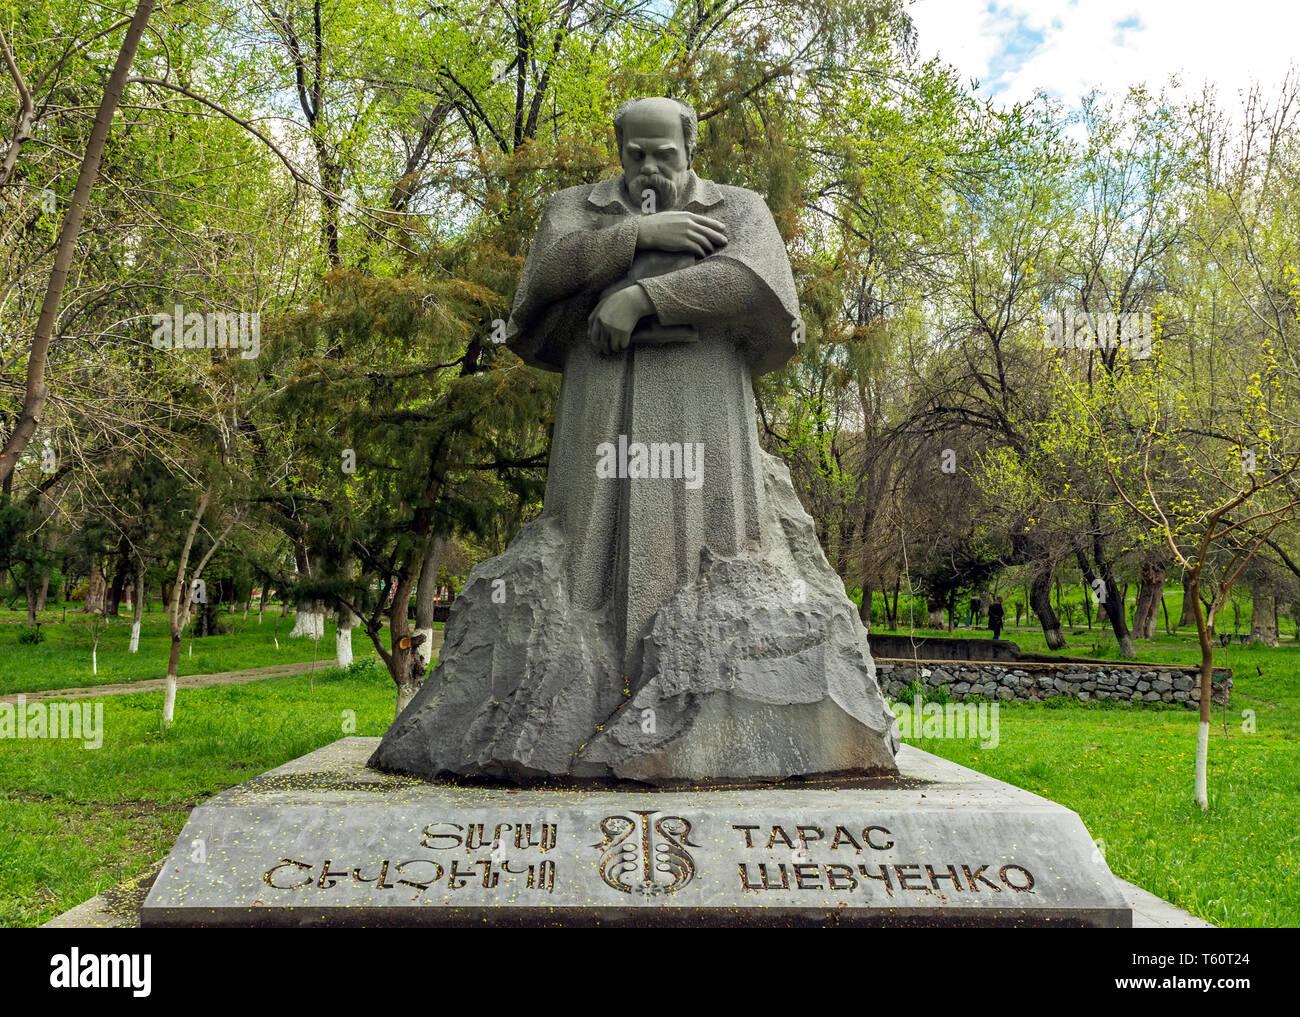 YEREVAN,ARMENIA - APRIL 18,2019: The statue of Taras Shevchenko - ukrainian poet and writer. Also known as an artist, novelist, ethnographe - Stock Image